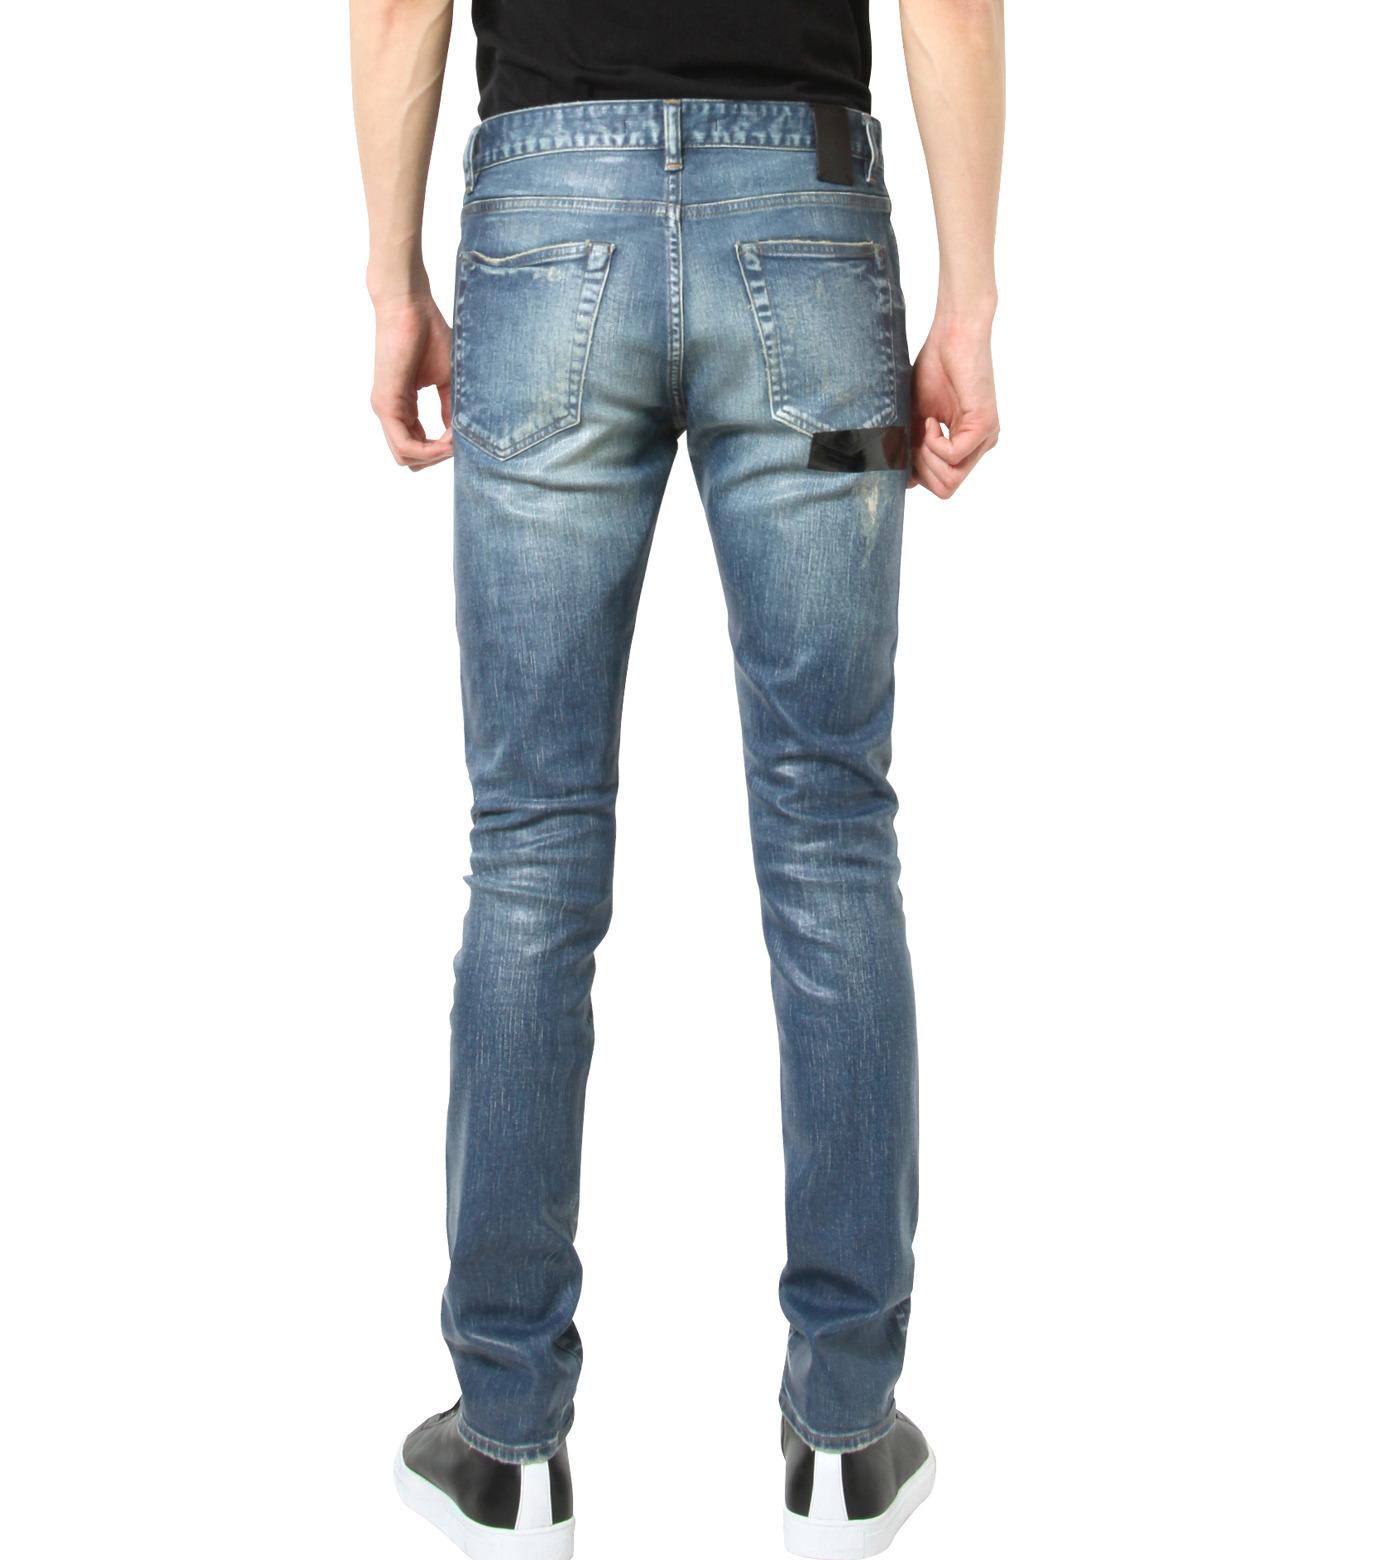 HL HEDDIE LOVU(エイチエル・エディールーヴ)のIndigo Coat Skin Slim-NAVY(パンツ/pants)-17S98005-93 拡大詳細画像2